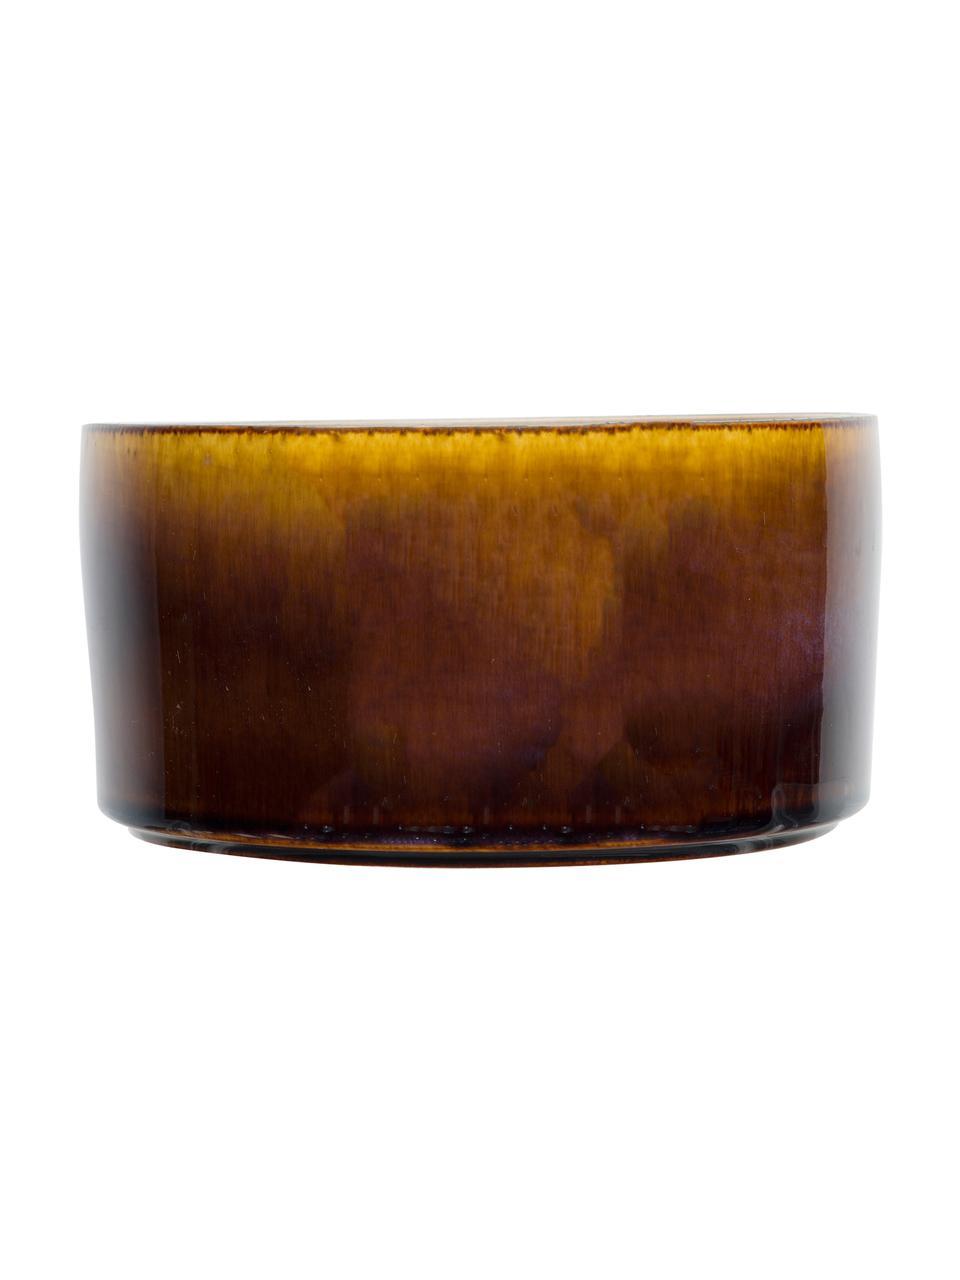 Cuencos artesanales Quintana, 2uds., Porcelana, Ámbar, marrón, Ø 14 cm